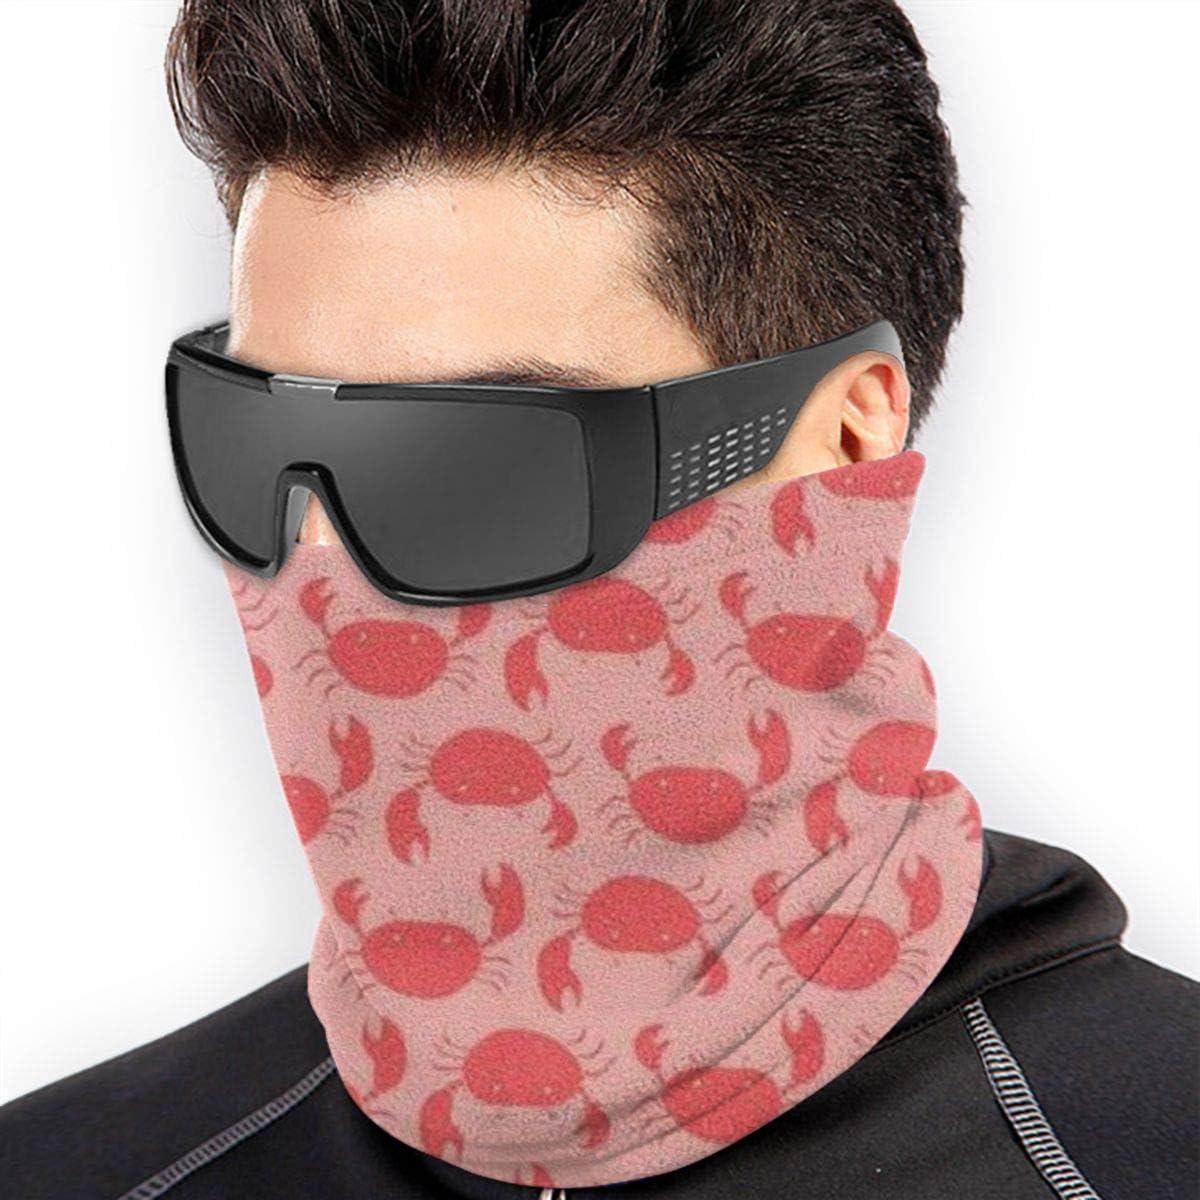 Crab Neck Warmer Gaiter For Men Women Headband Face Mask Bandana Head Wrap Scarf Headwear Winter Balaclava For Ski Running Motorcycle